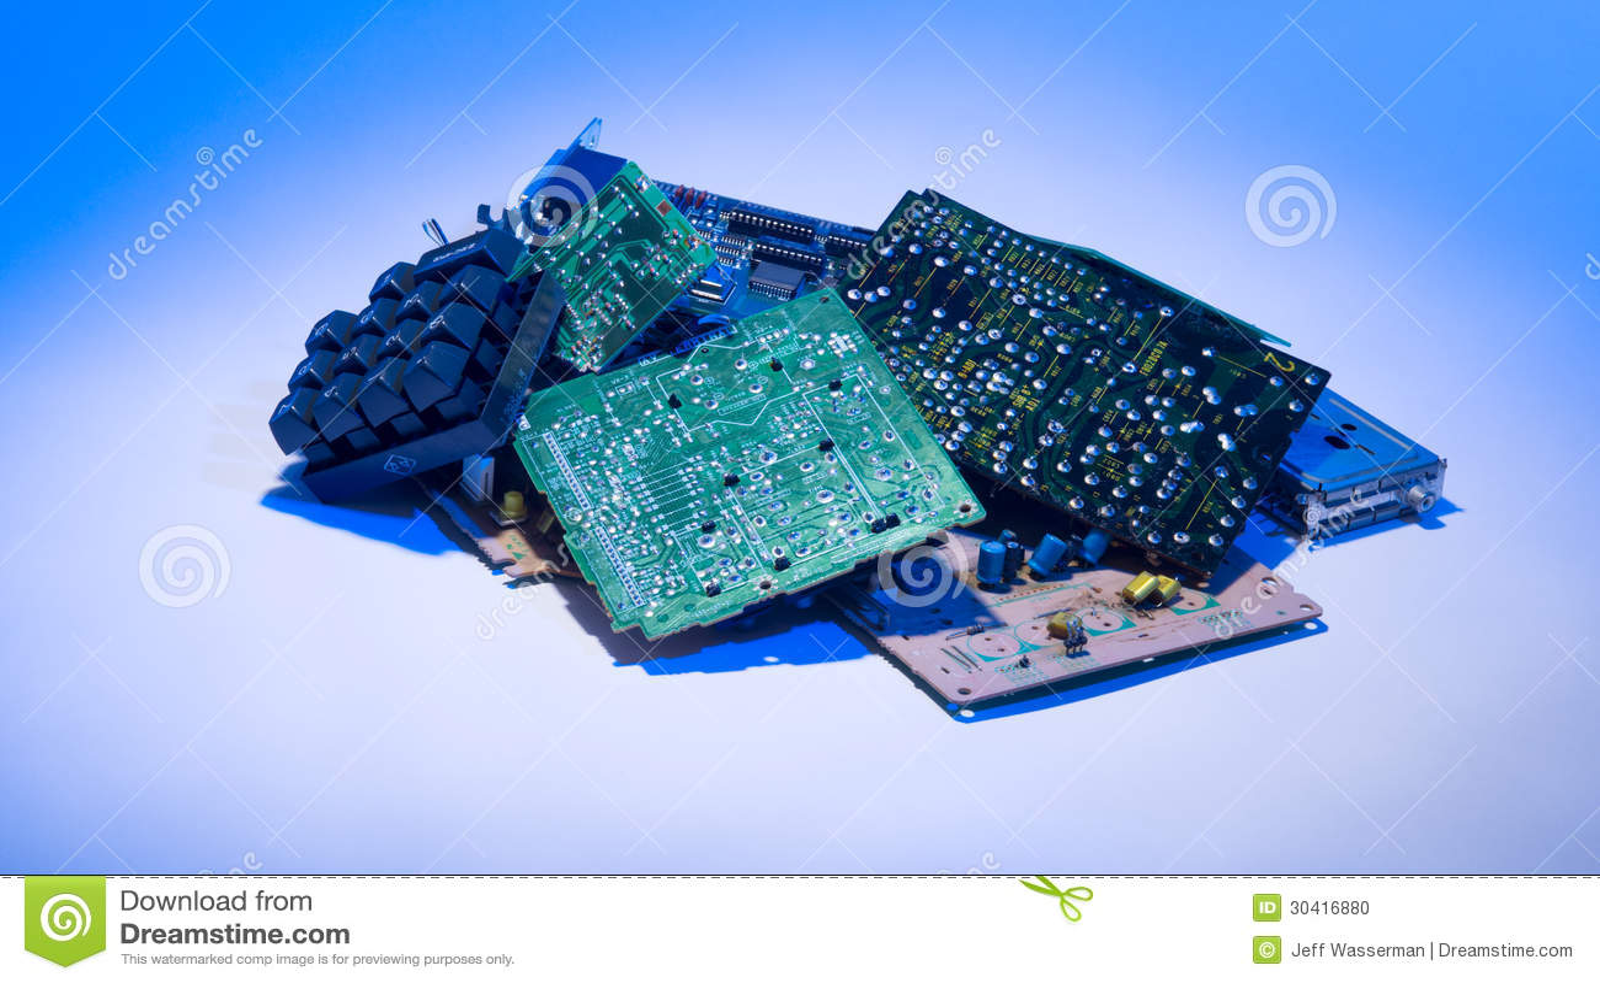 Digital Trash In Garbage Pile Stock Photo Image 30416880